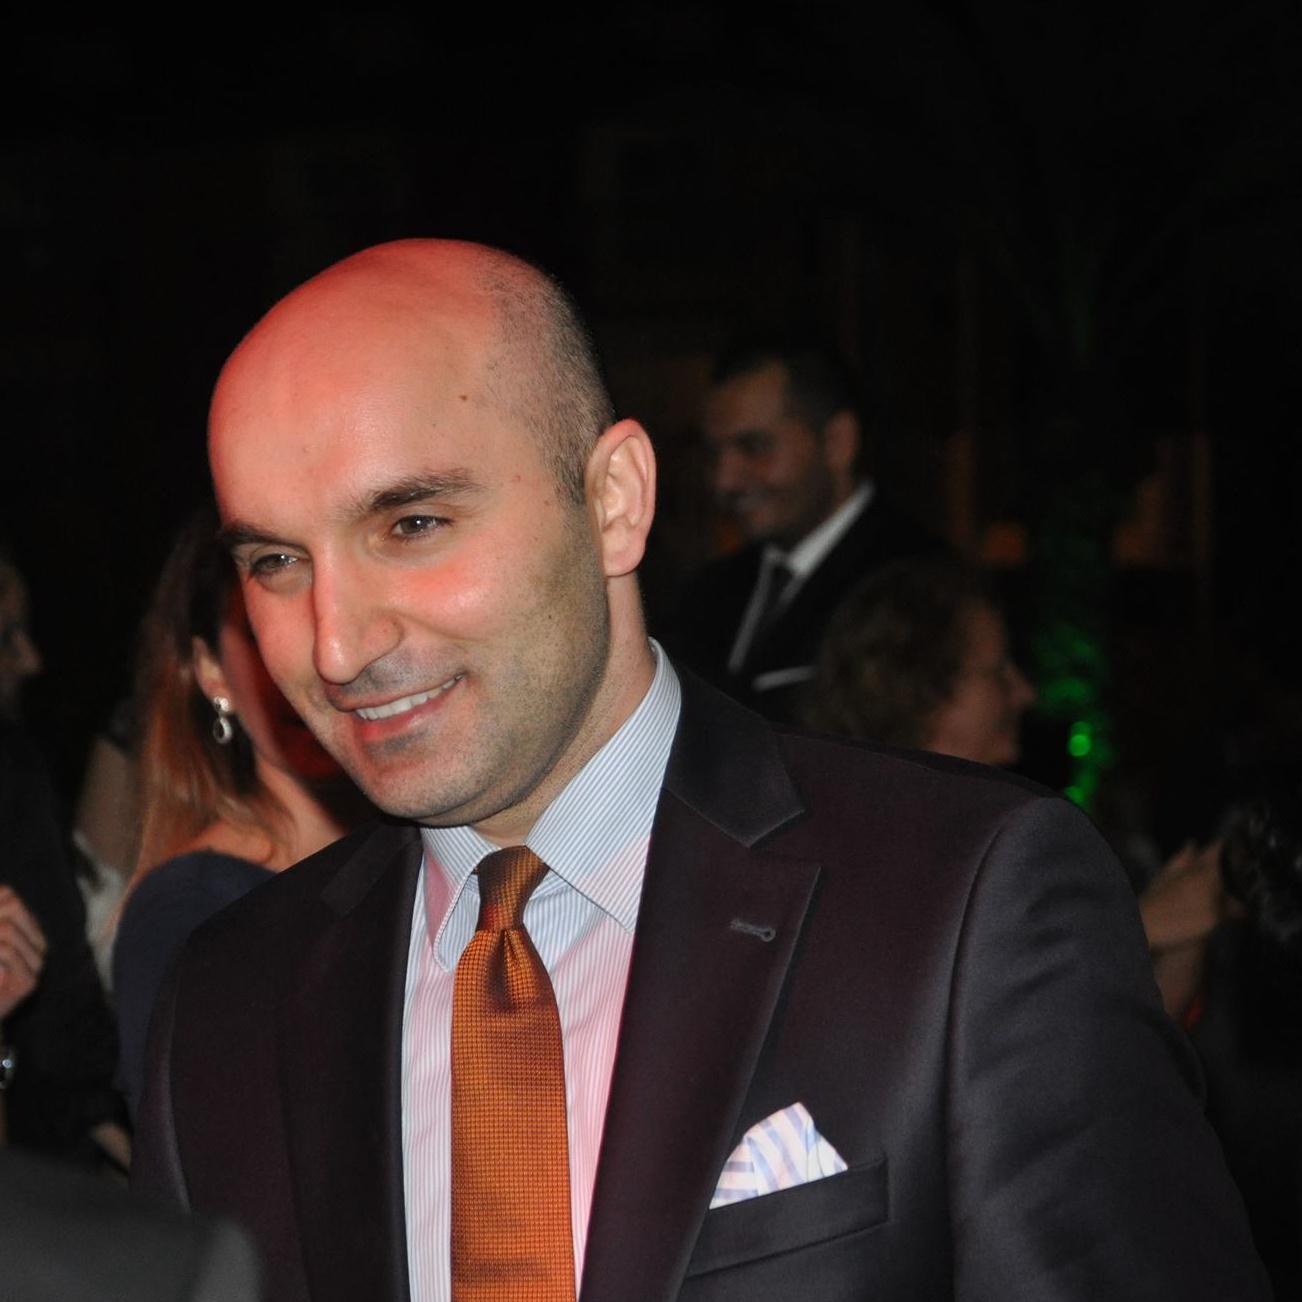 Mehmet Levent Kılıçoğlu